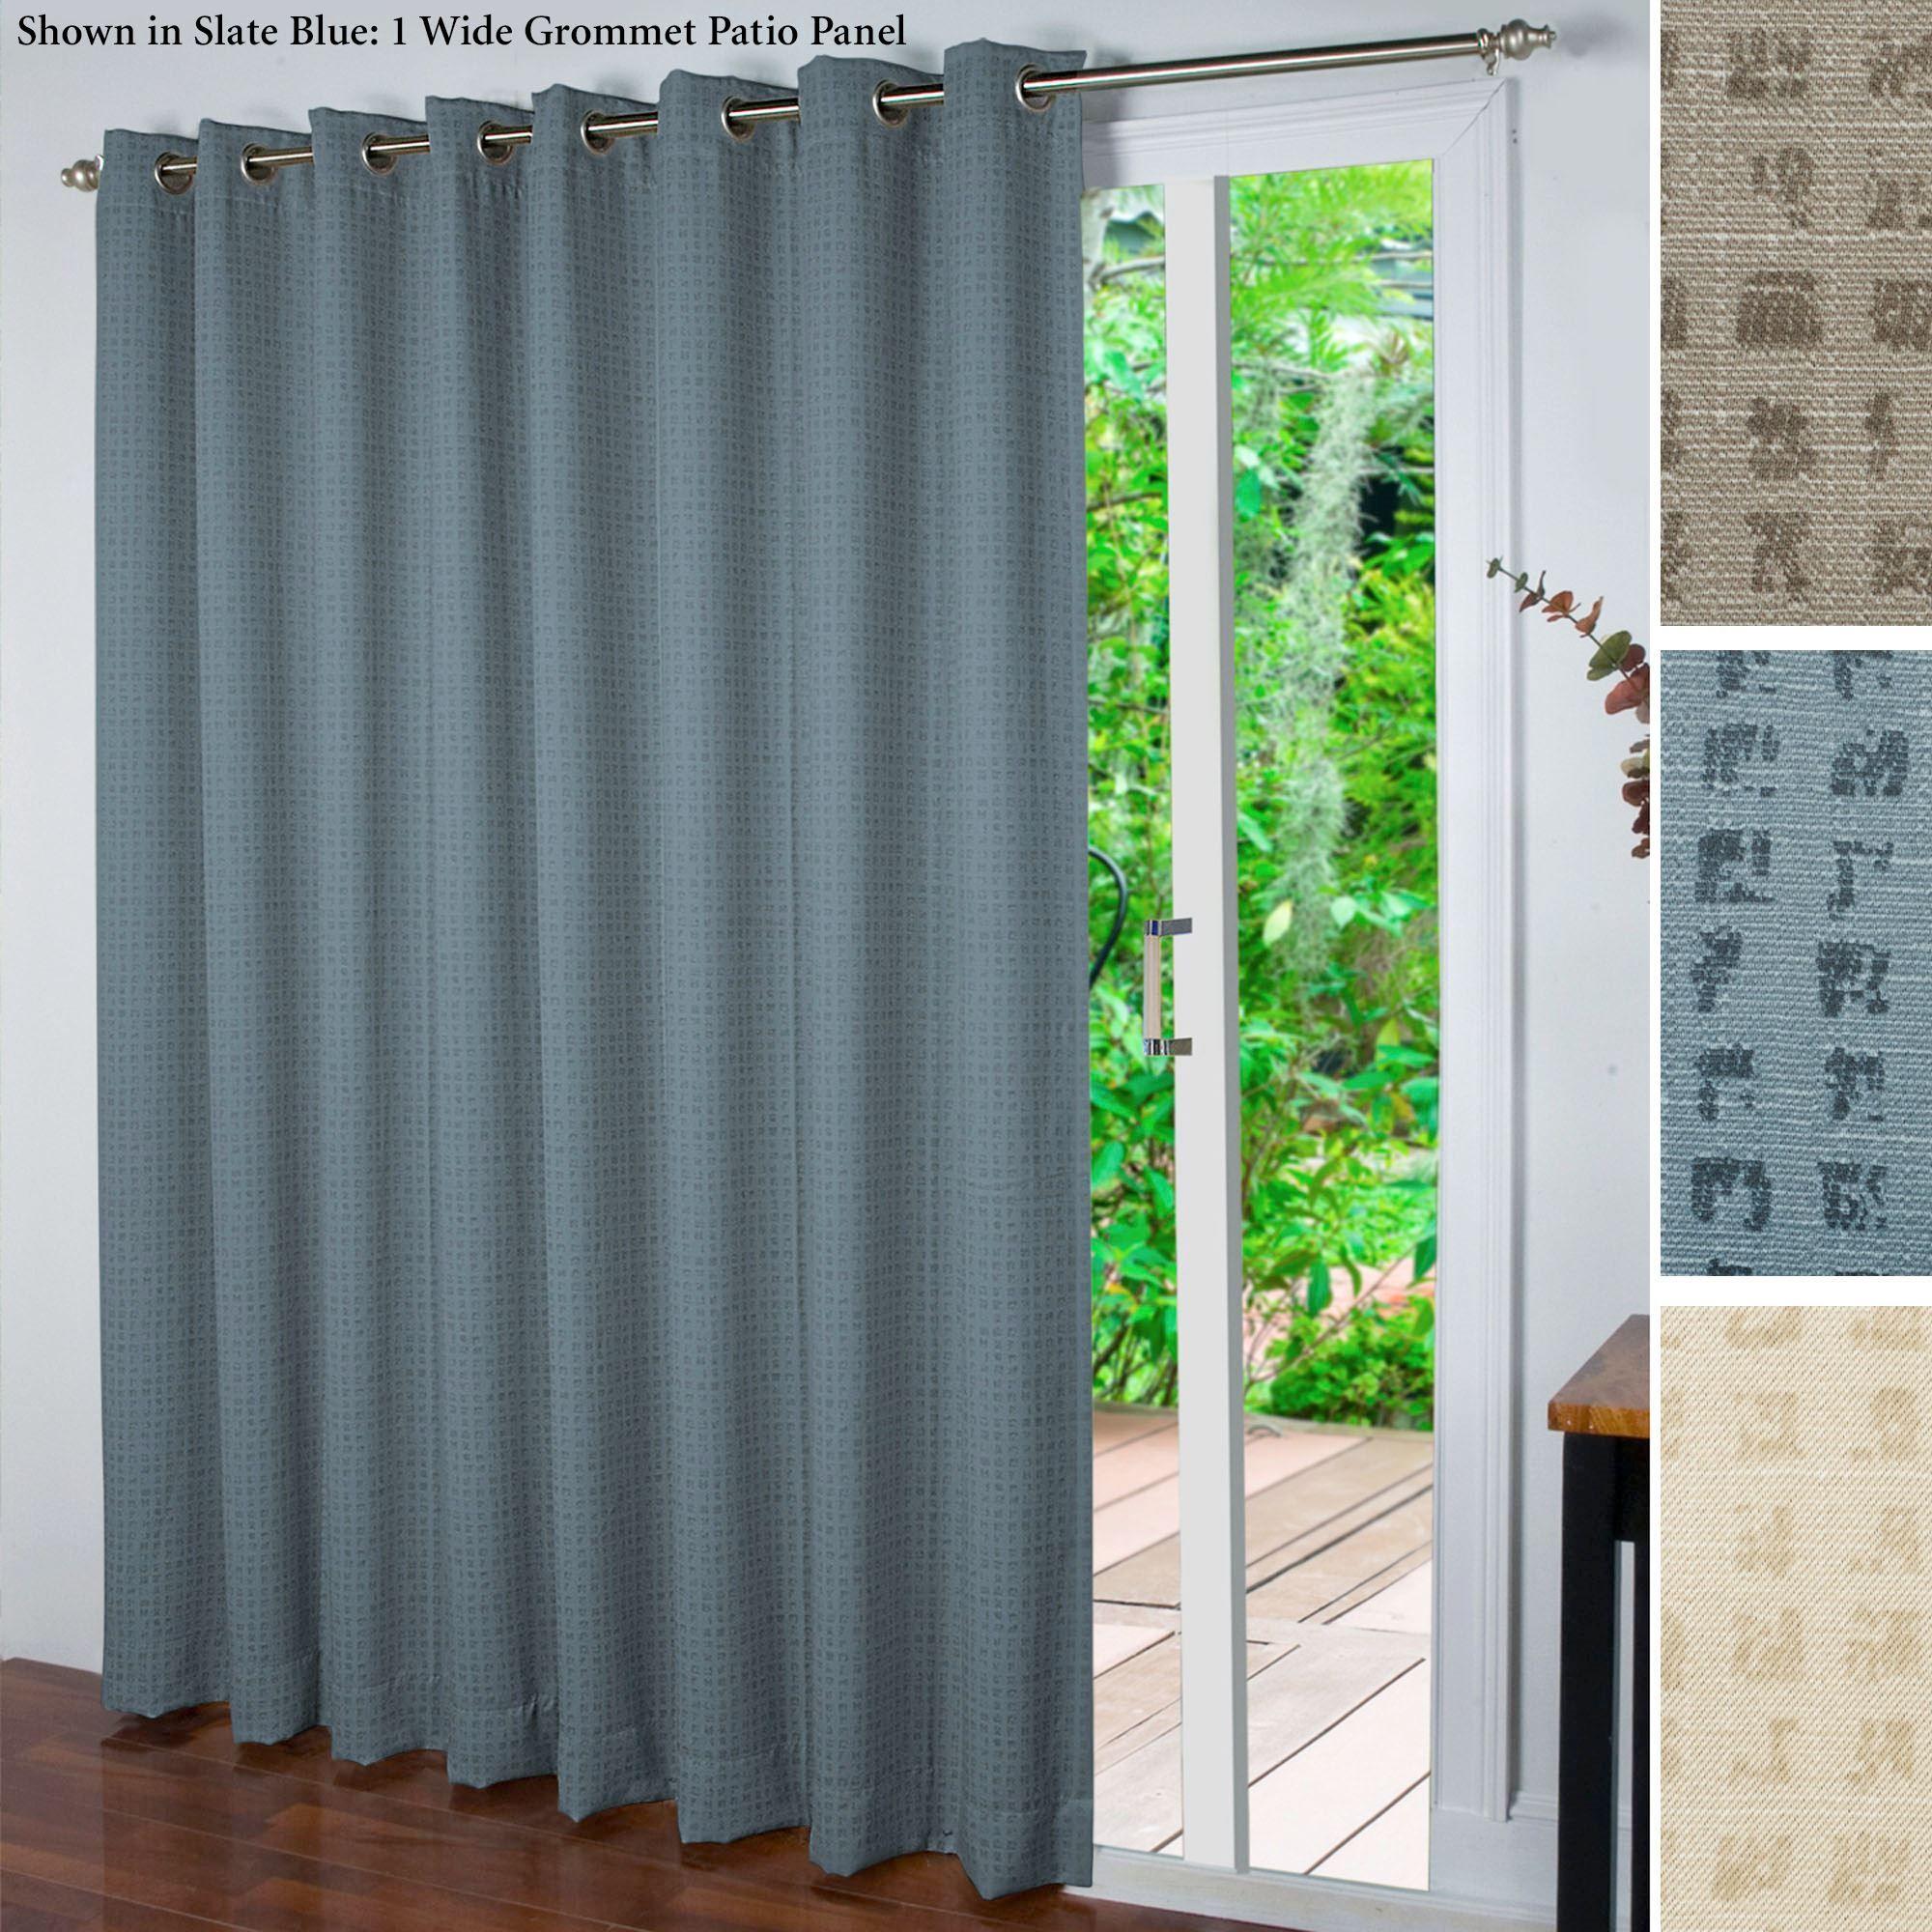 Spanish Steps Room Darkening Grommet Patio Panel Sliding Door Curtains Patio Curtains Patio Door Curtains